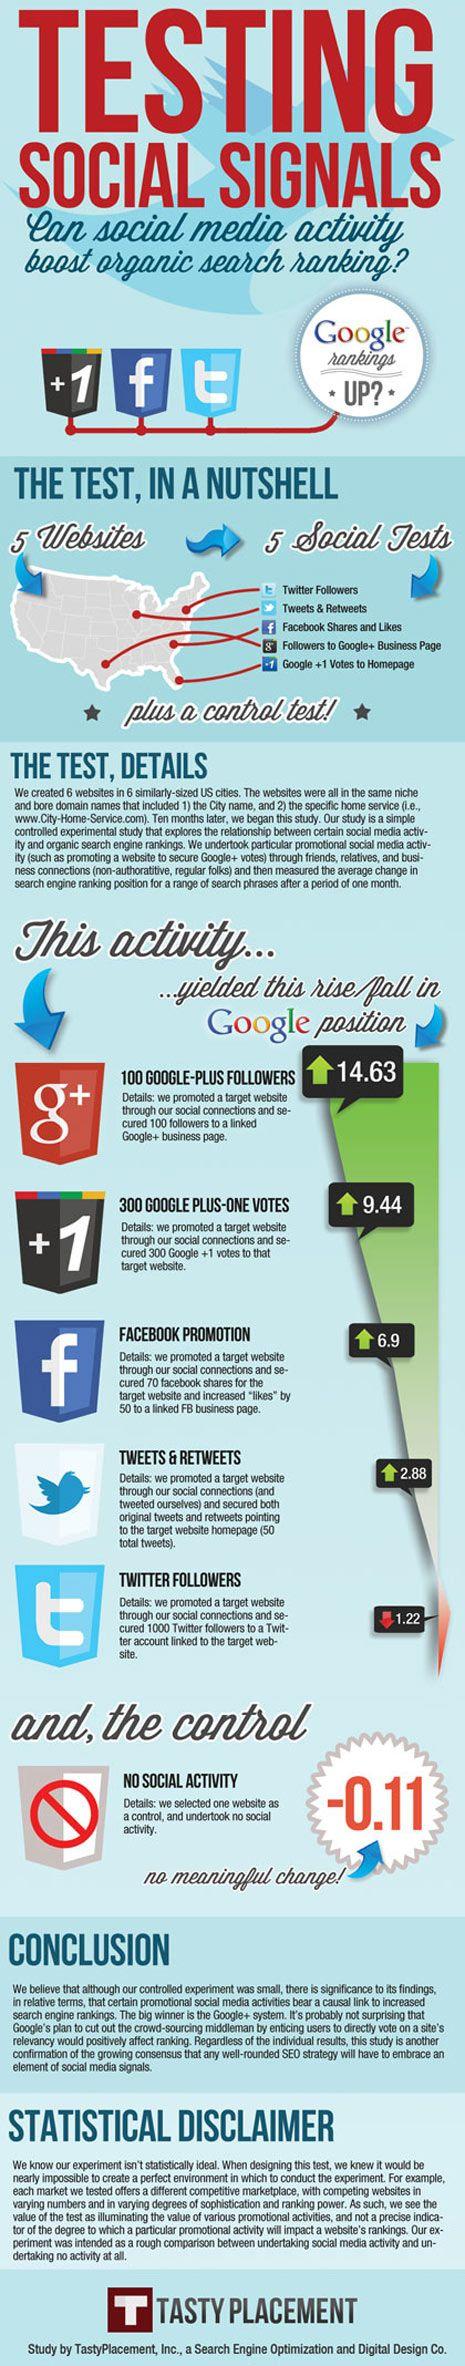 Testing social signals #infografia #infographic #socialmedia